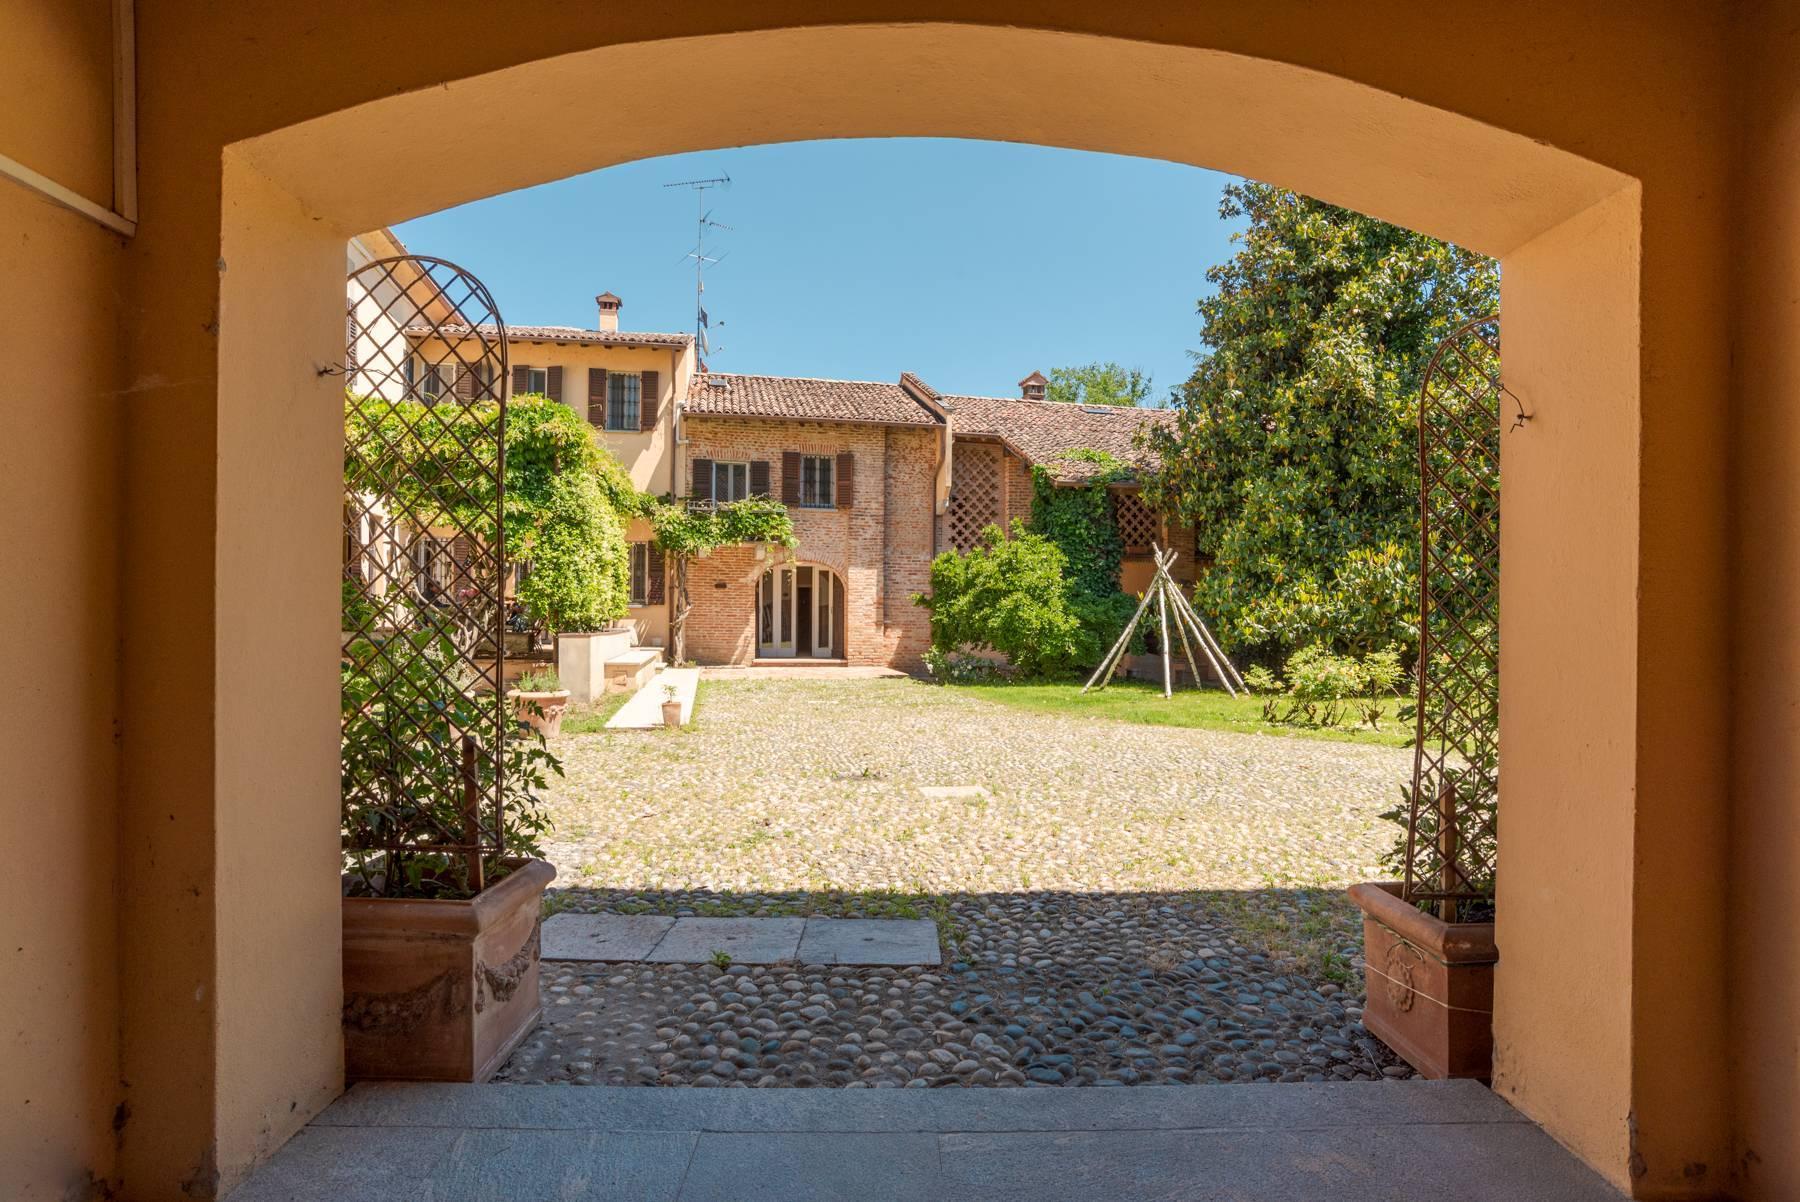 Magnifica proprietà immersa nel verde a Pavia - 24